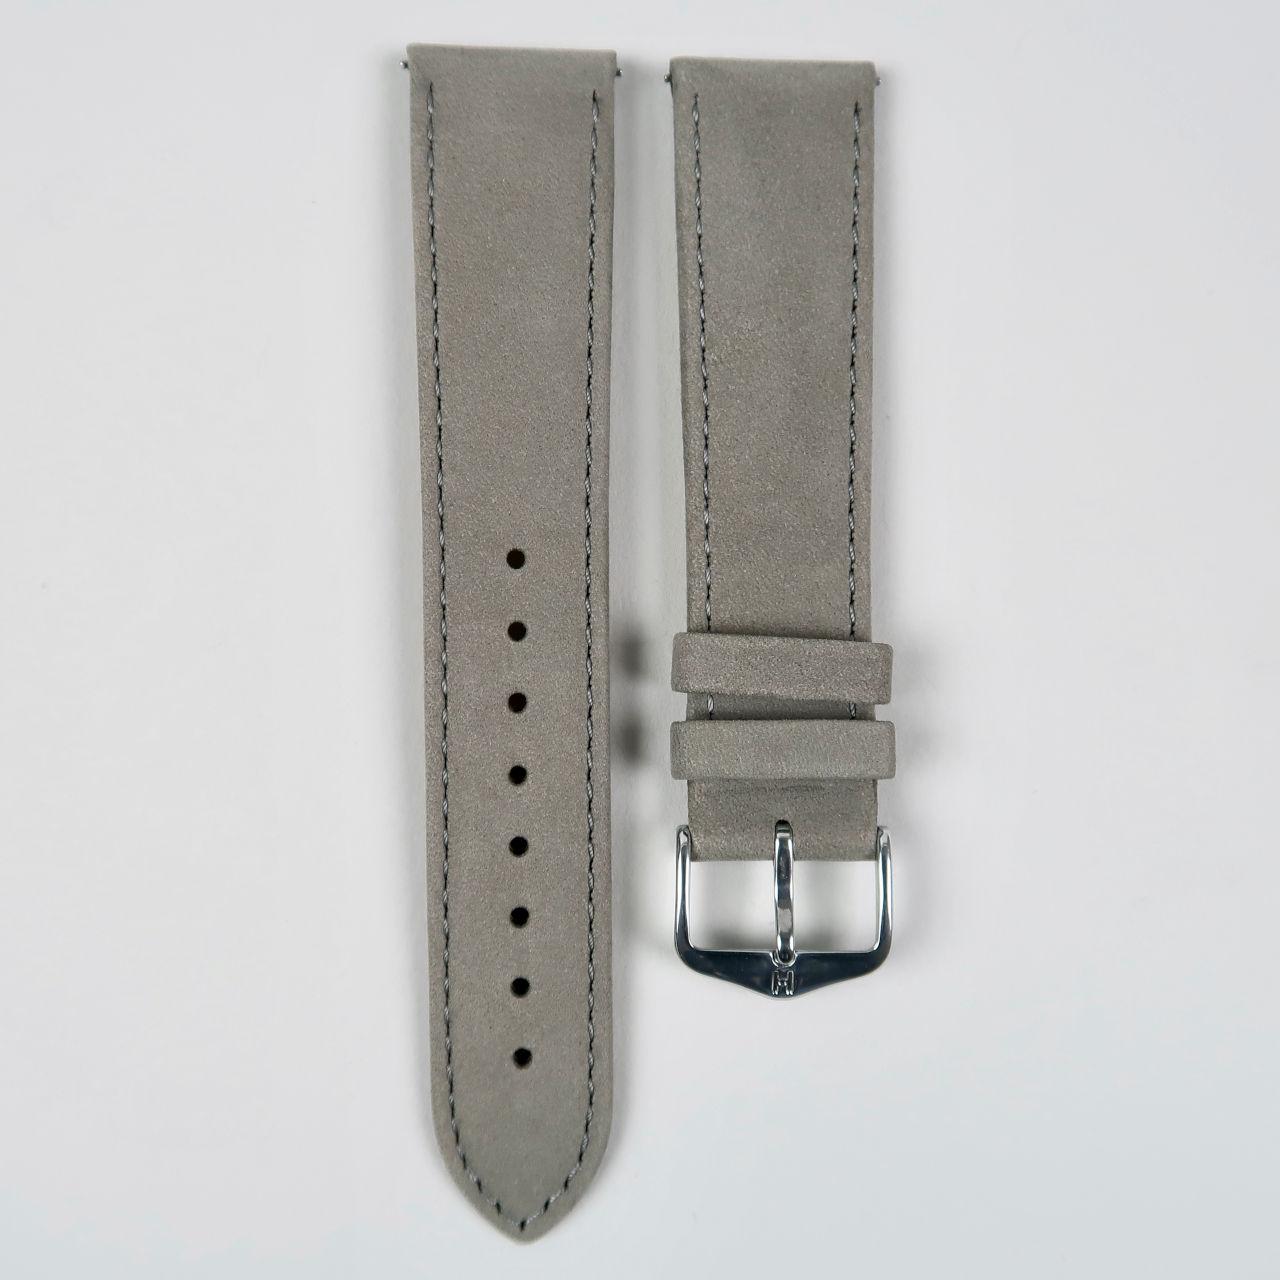 Hirsch Osiris Nubuk grey suede finished leather watch straps